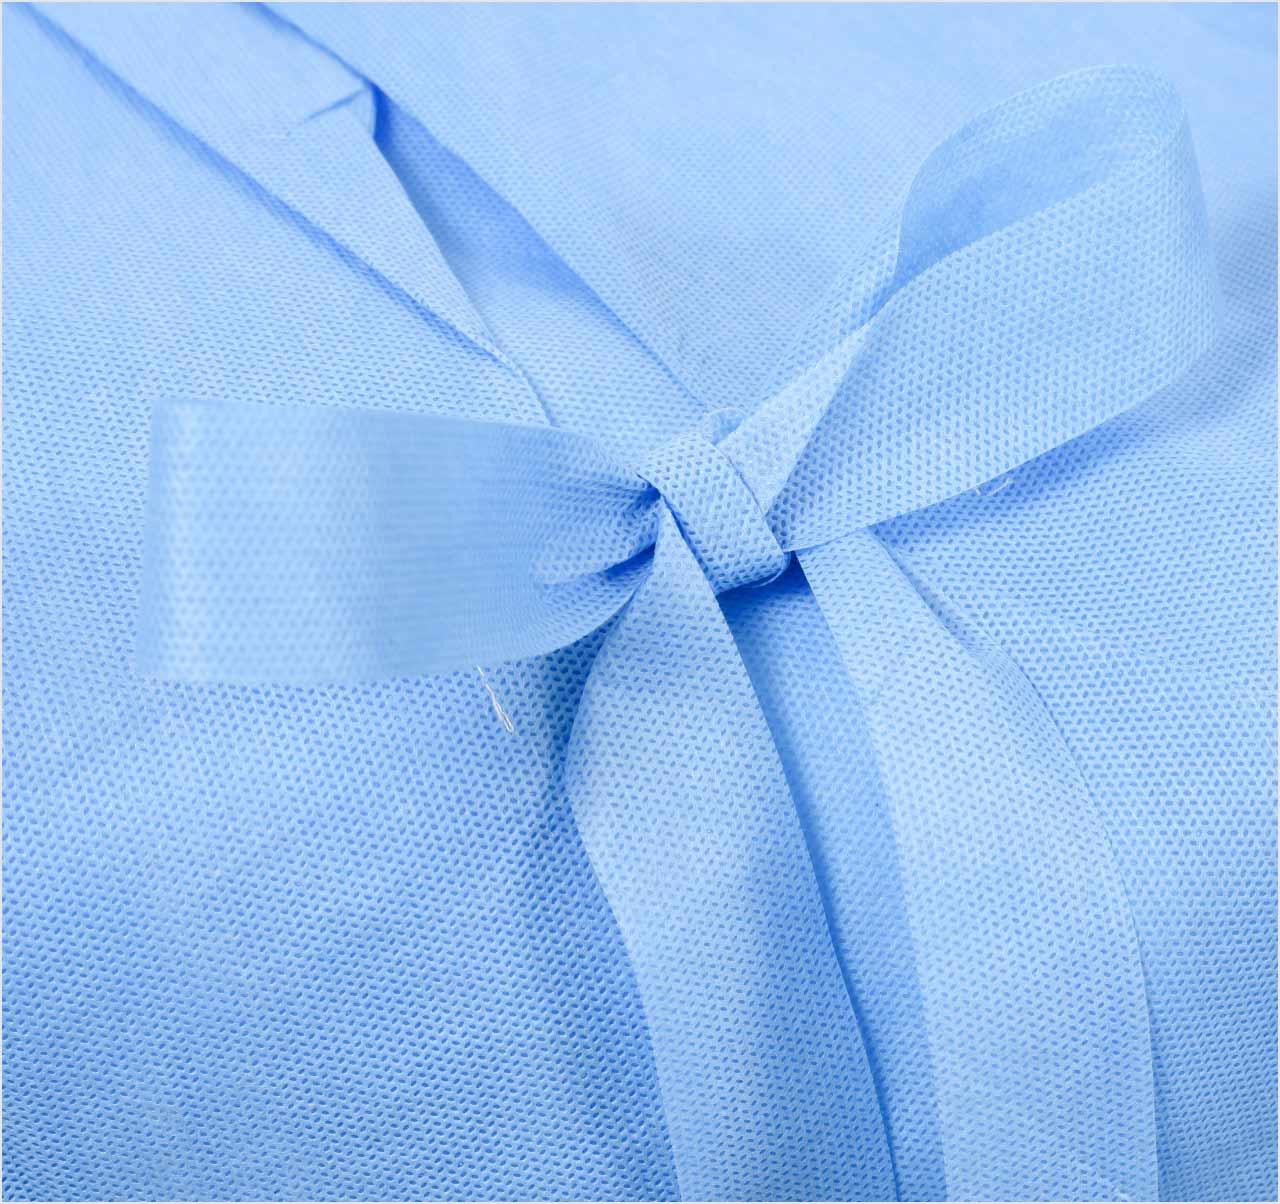 MediaBlink Medical Gowns waist straps